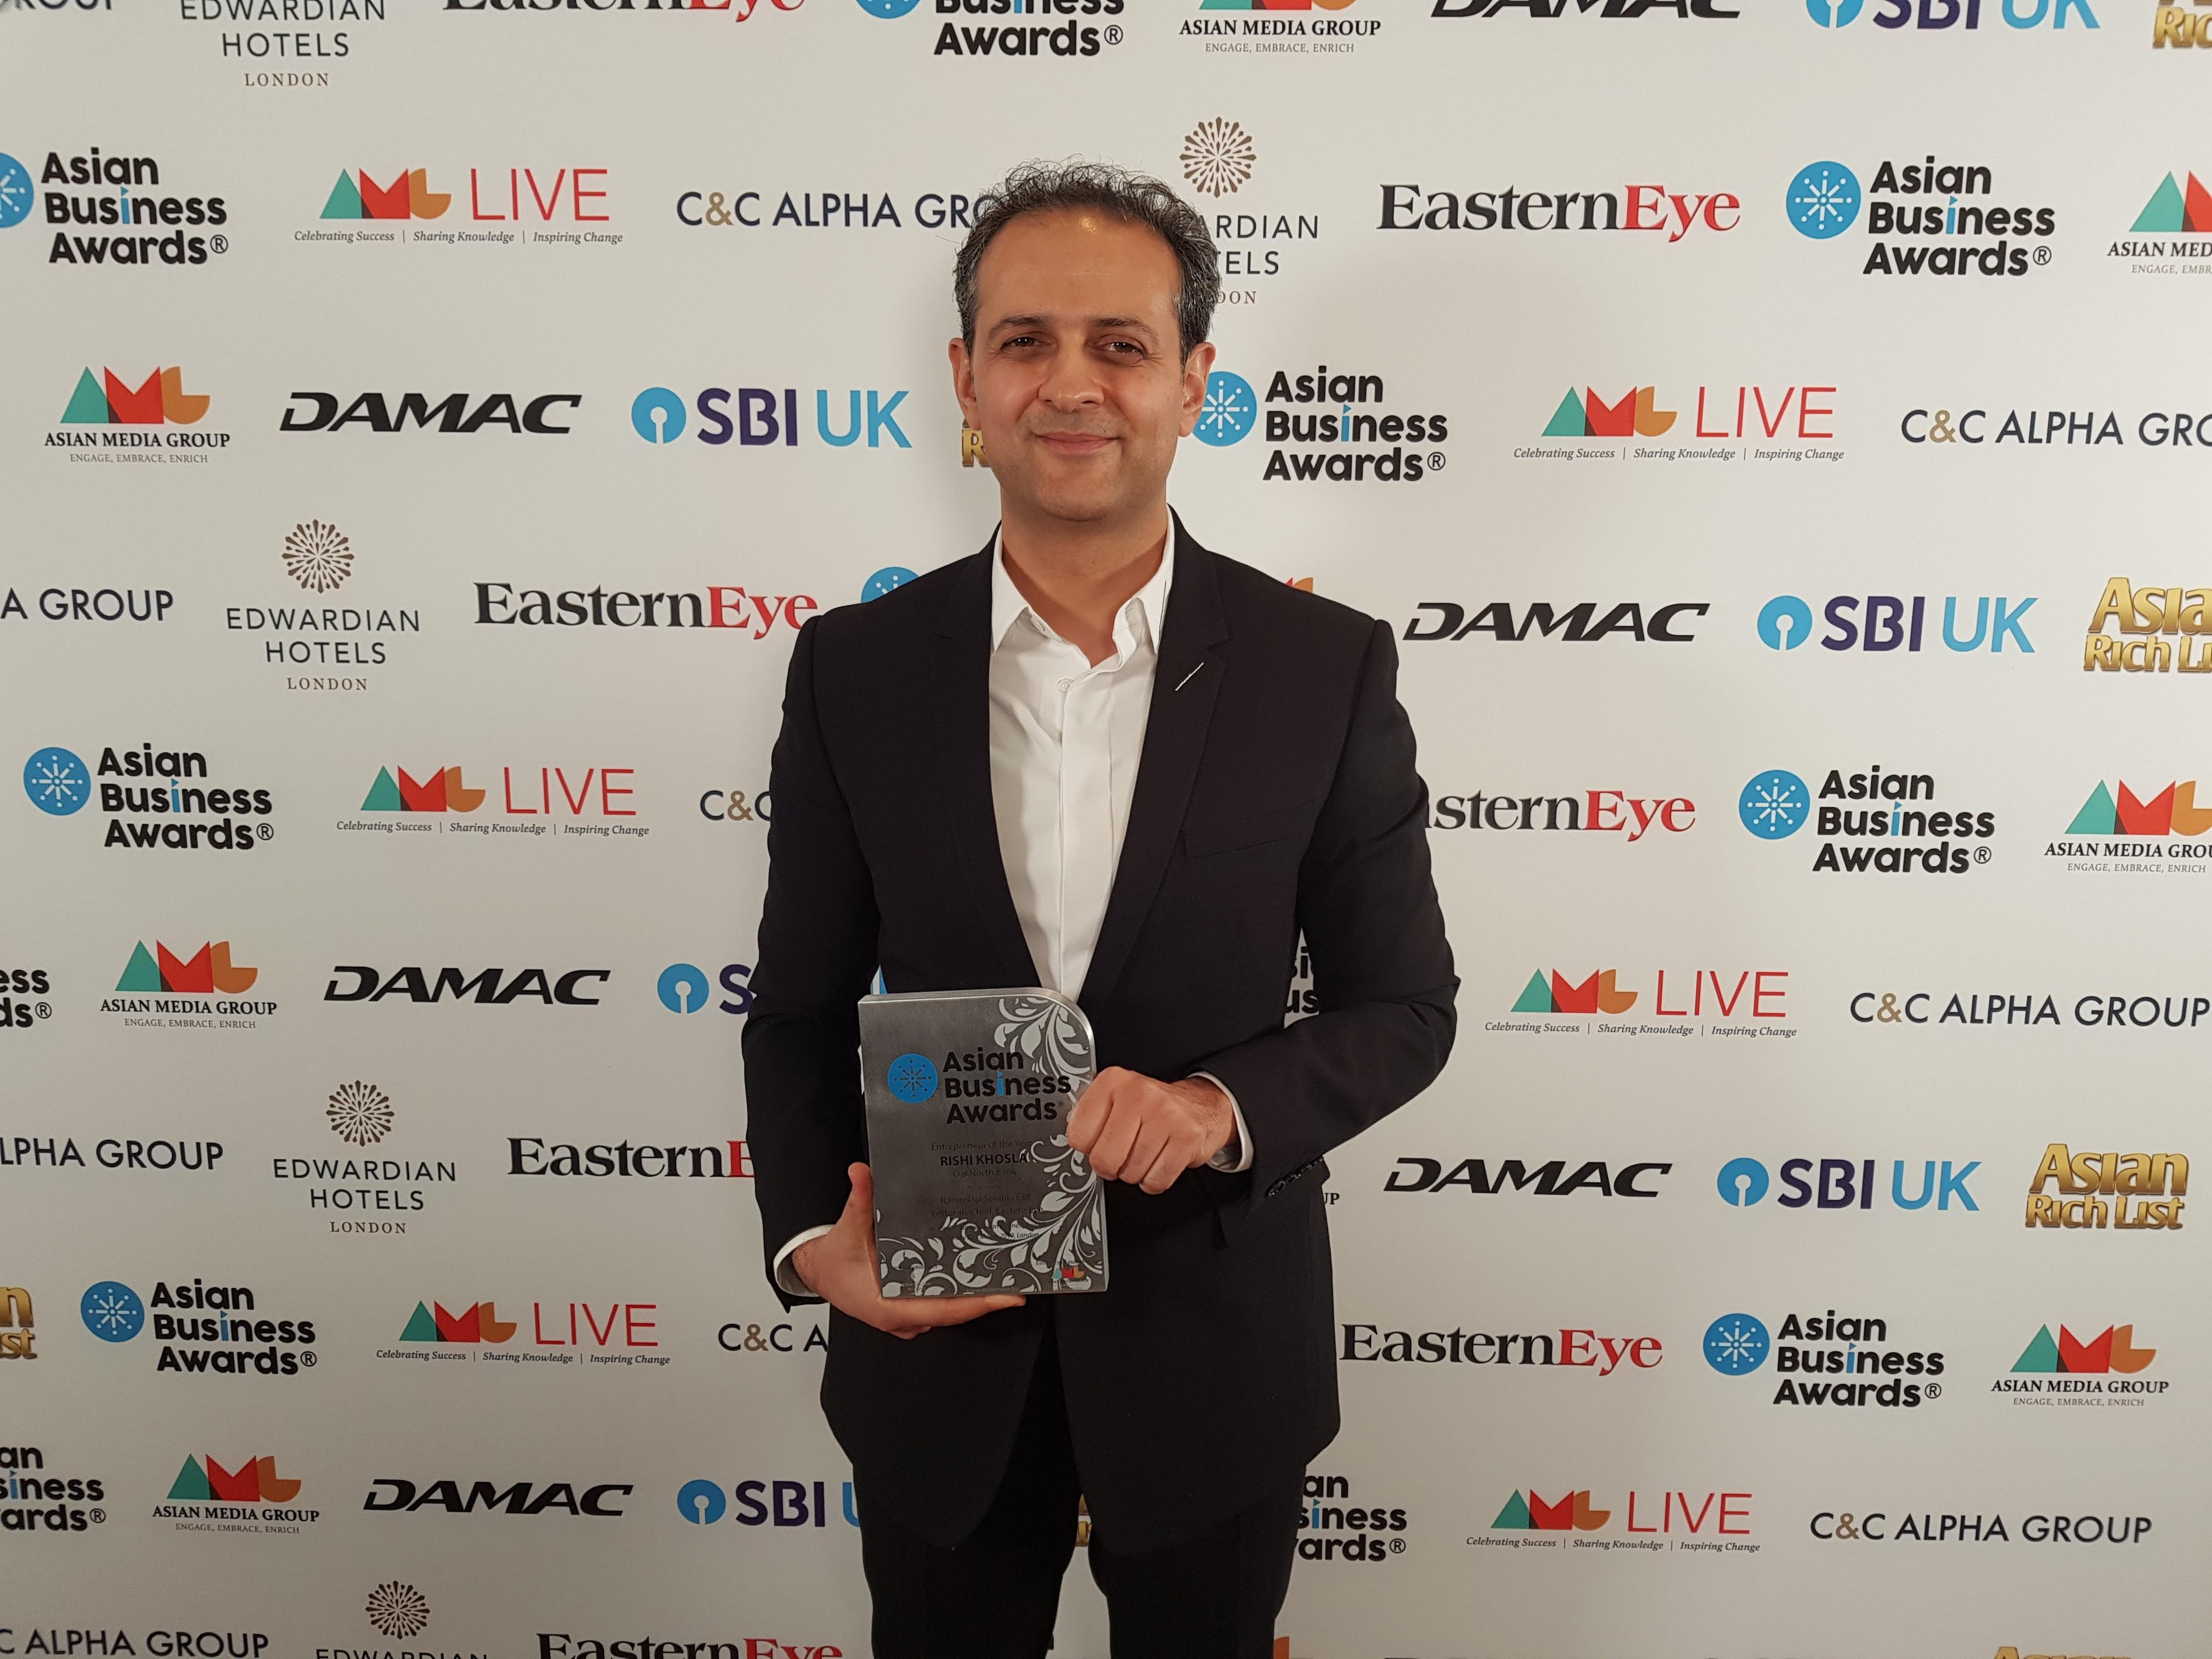 Rishi Khosla collects an award at Asian Business Awards